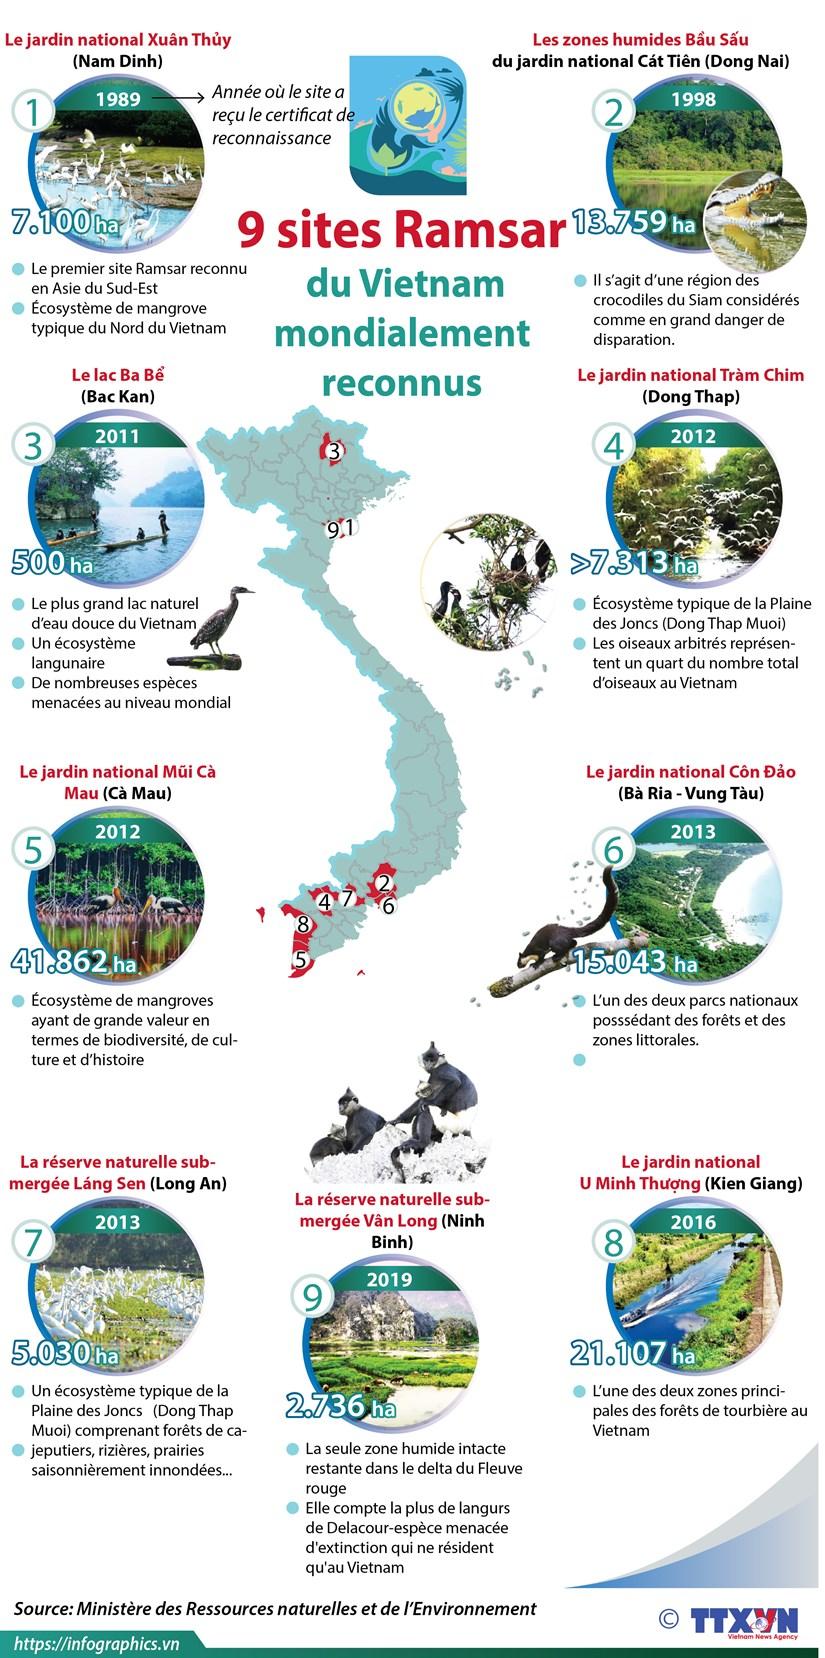 Neuf sites Ramsar du Vietnam mondialement reconnus hinh anh 1